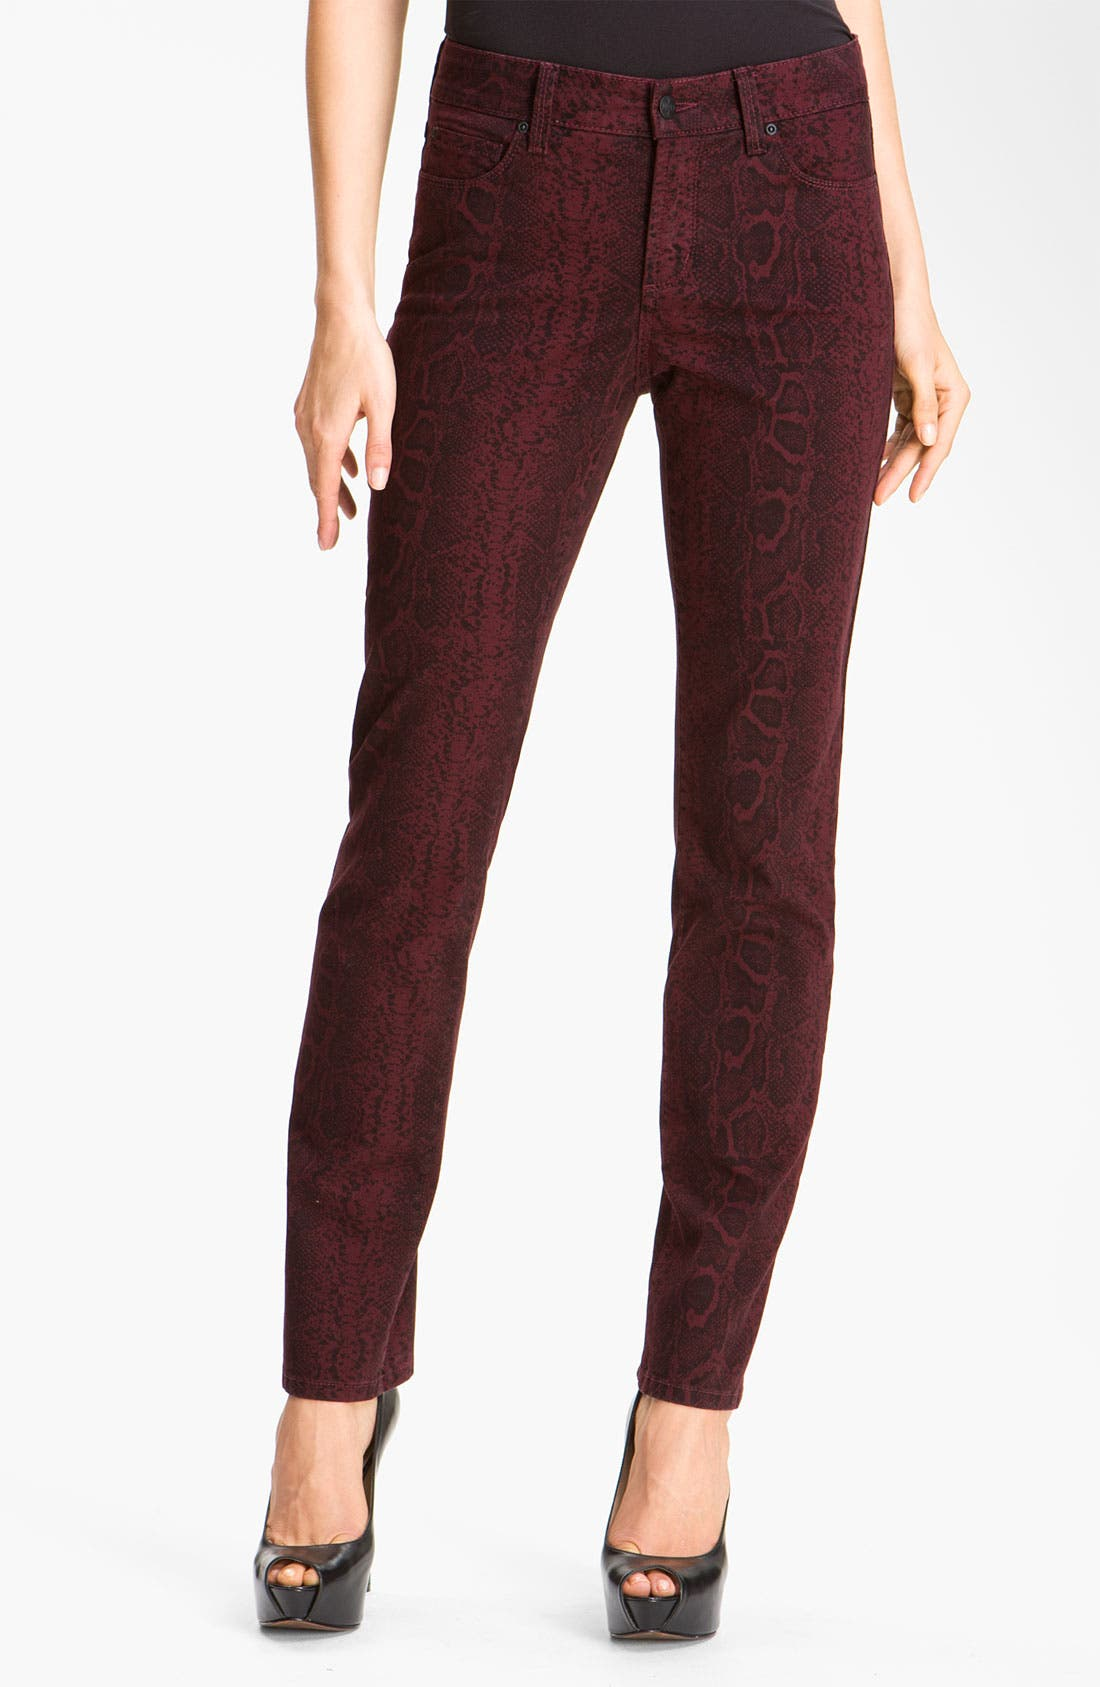 Main Image - NYDJ 'Sheri' Python Print Skinny Twill Jeans